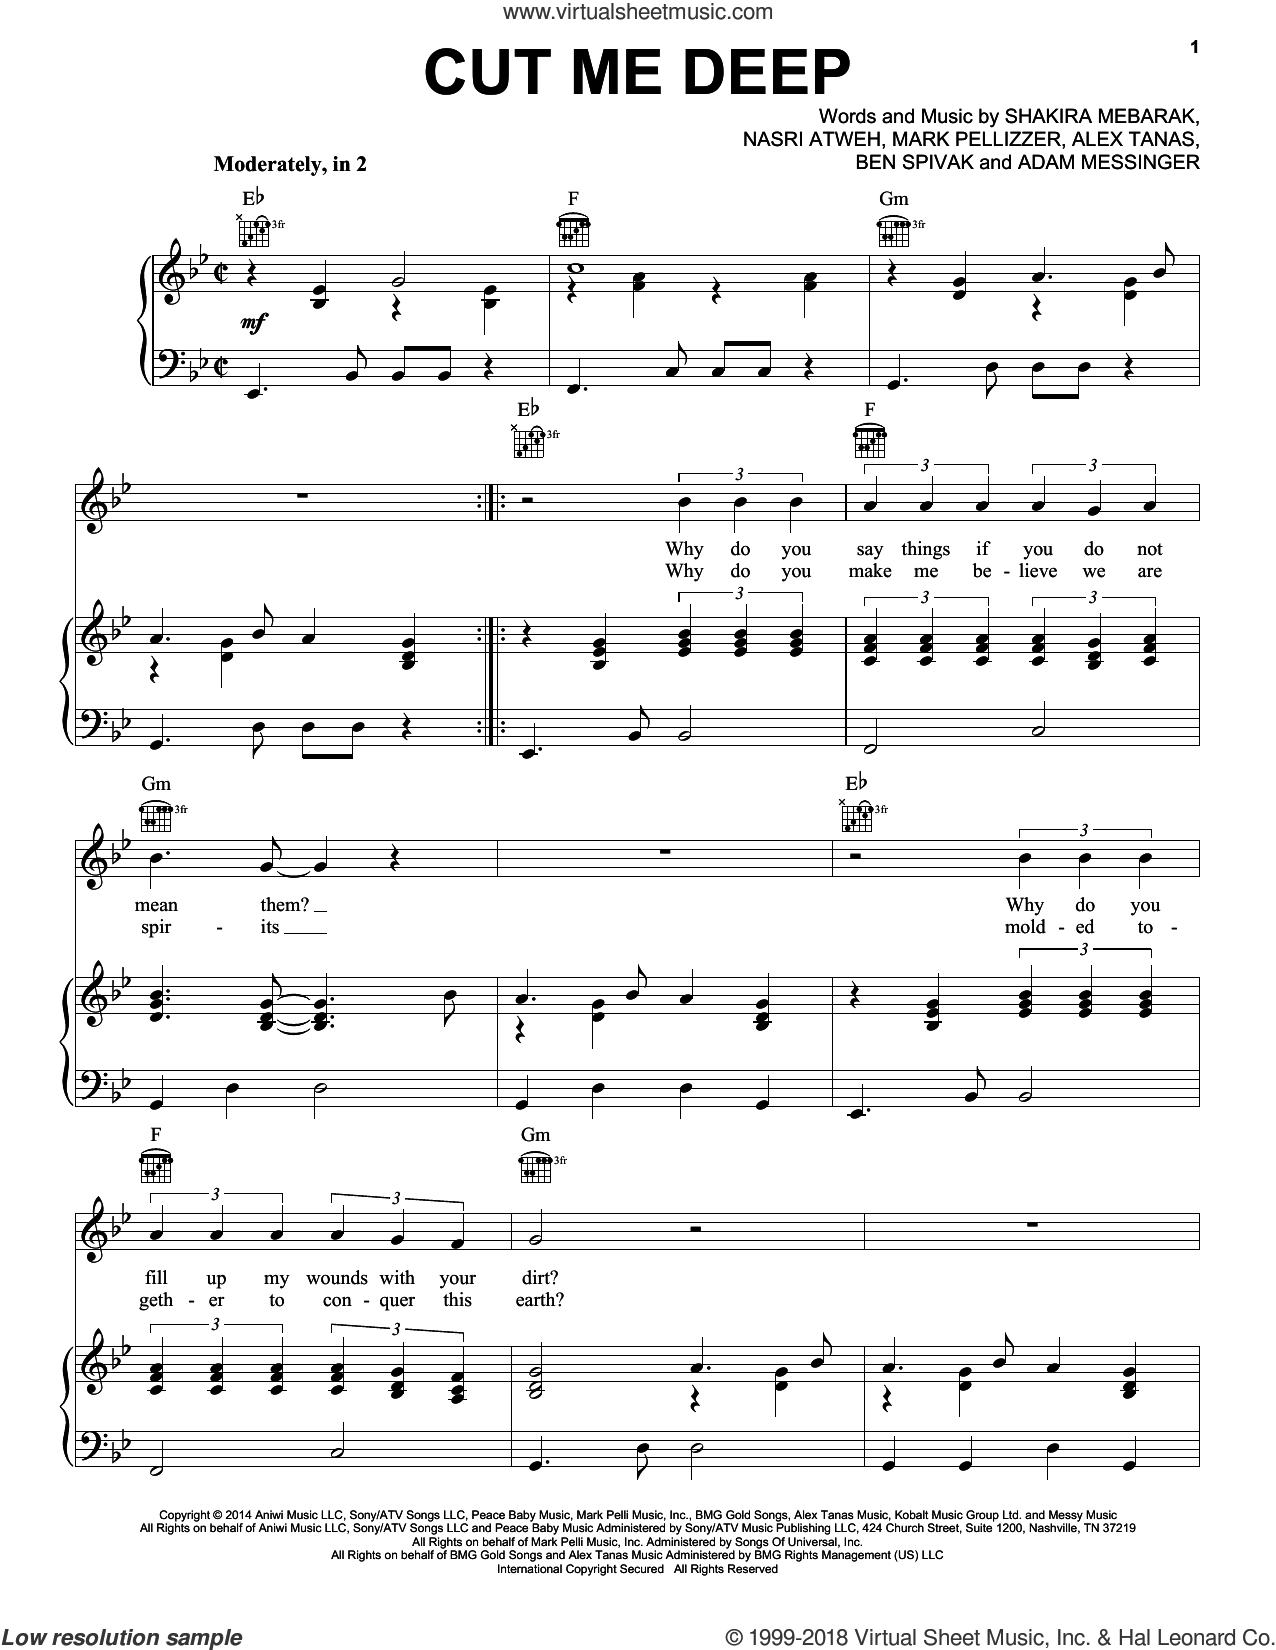 Cut Me Deep sheet music for voice, piano or guitar by Shakira, Adam Messinger, Alex Tanas, Ben Spivak, Mark Pellizzer, Nasri Atweh and Shakira Mebarak, intermediate skill level